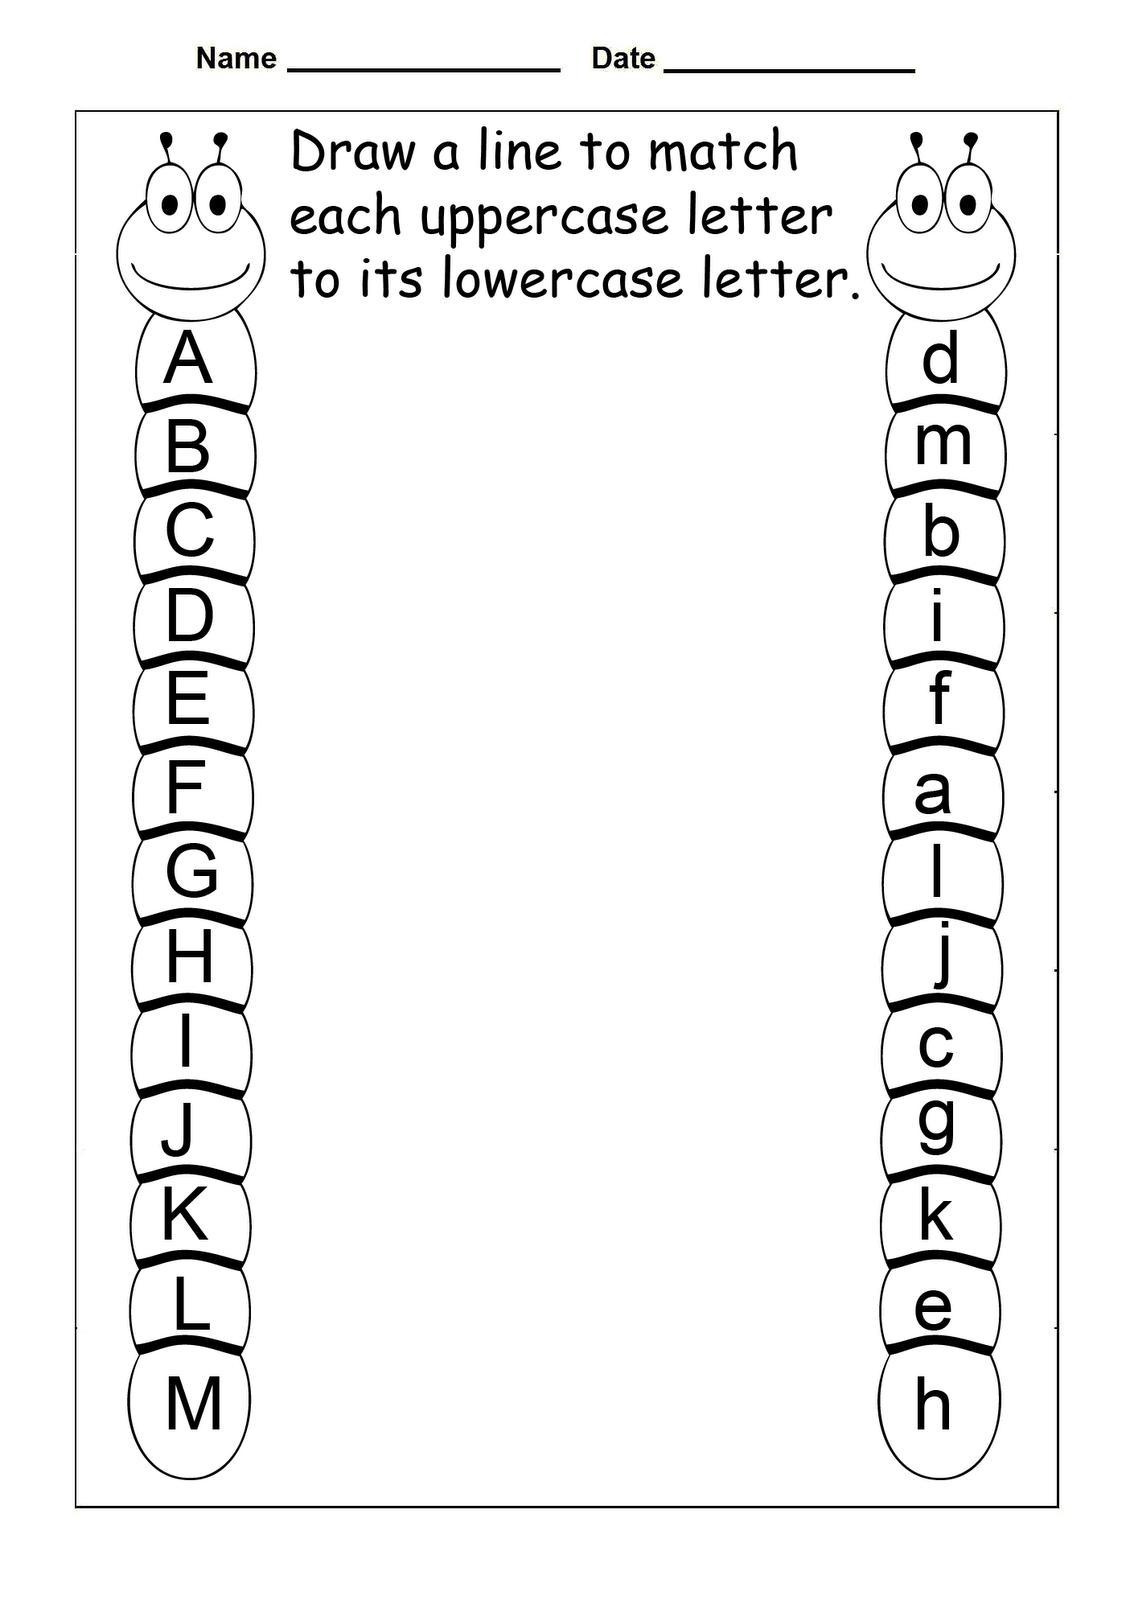 Worksheet  Free Printable Pre K Worksheets  Grass Fedjp Worksheet